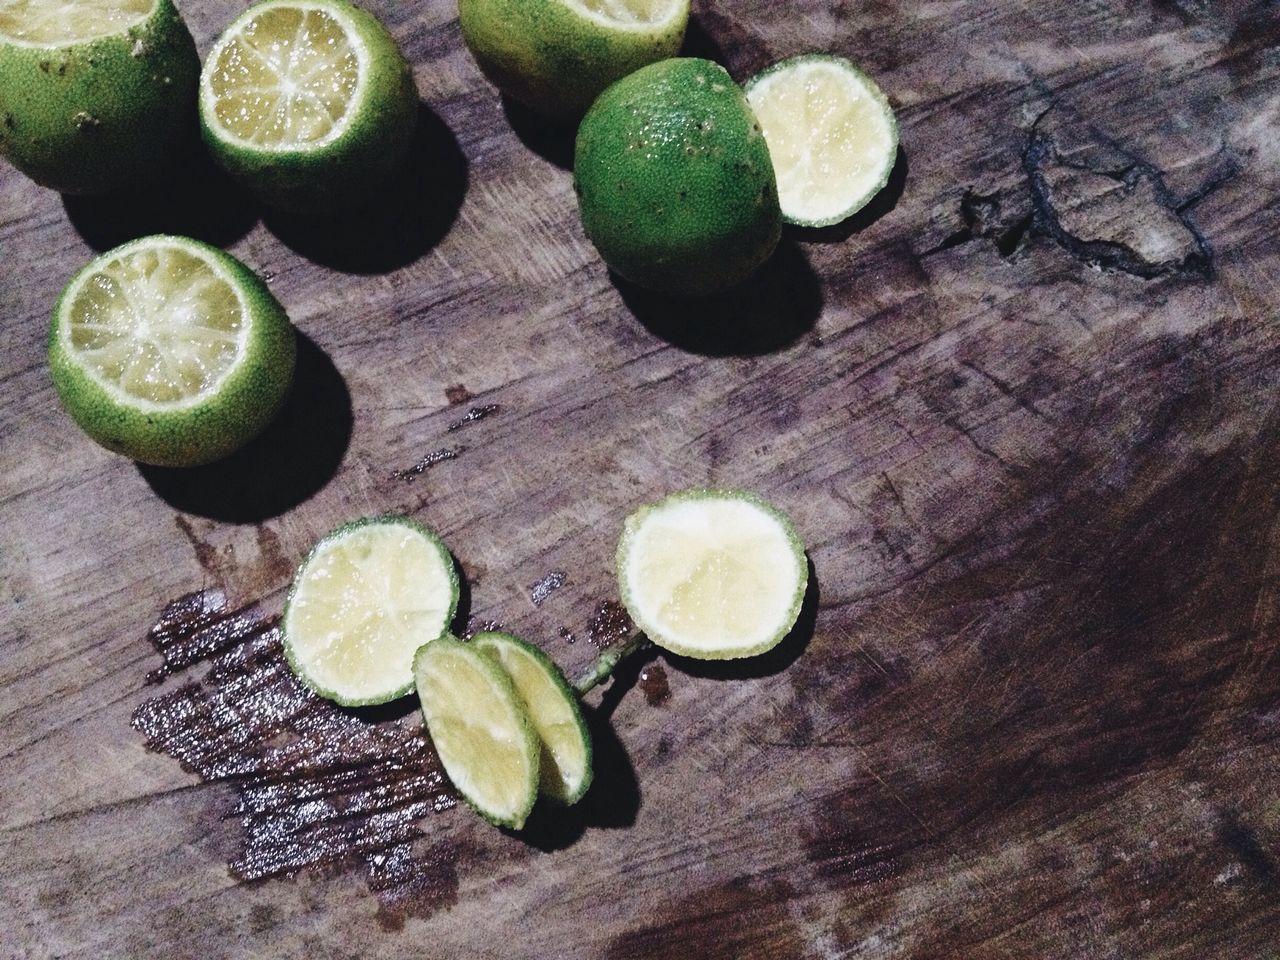 High Angle View Of Limes On Table